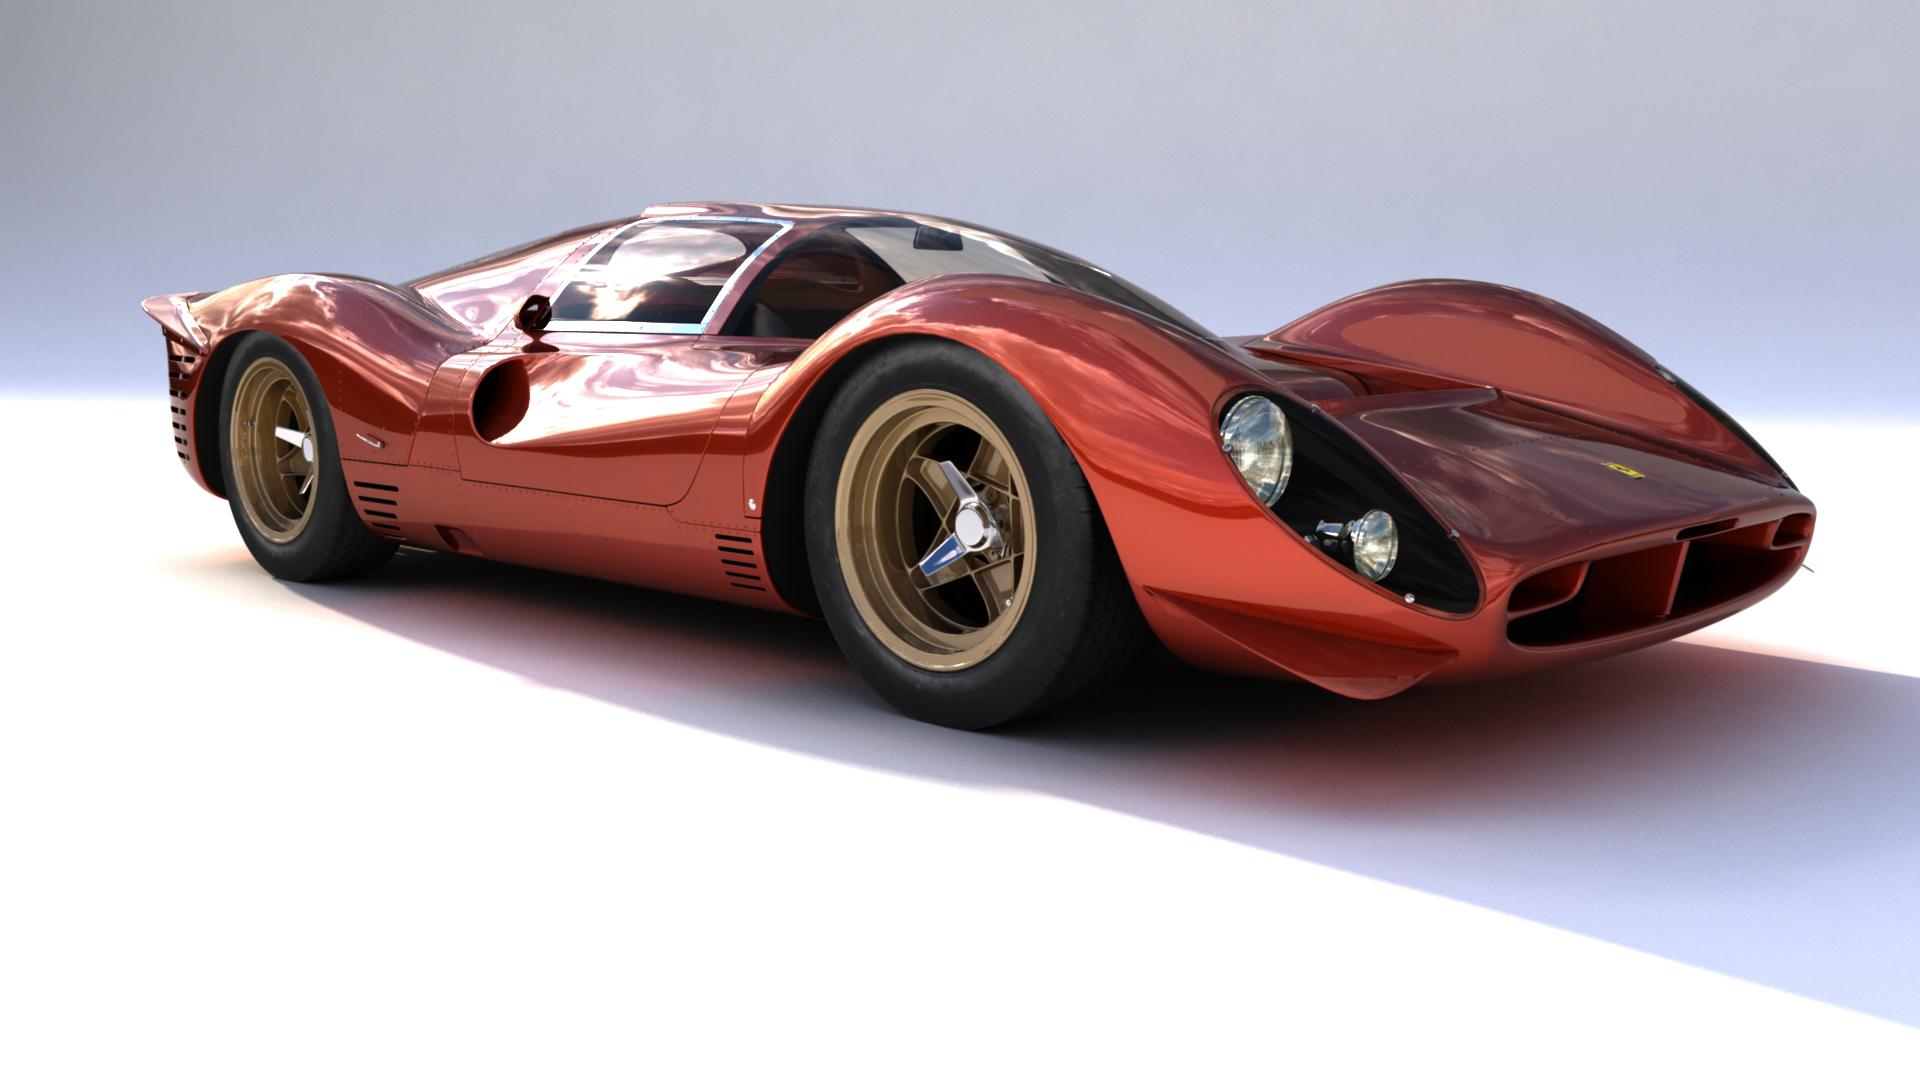 FERRARI 330 P4 MAYA MODEL Ferrari